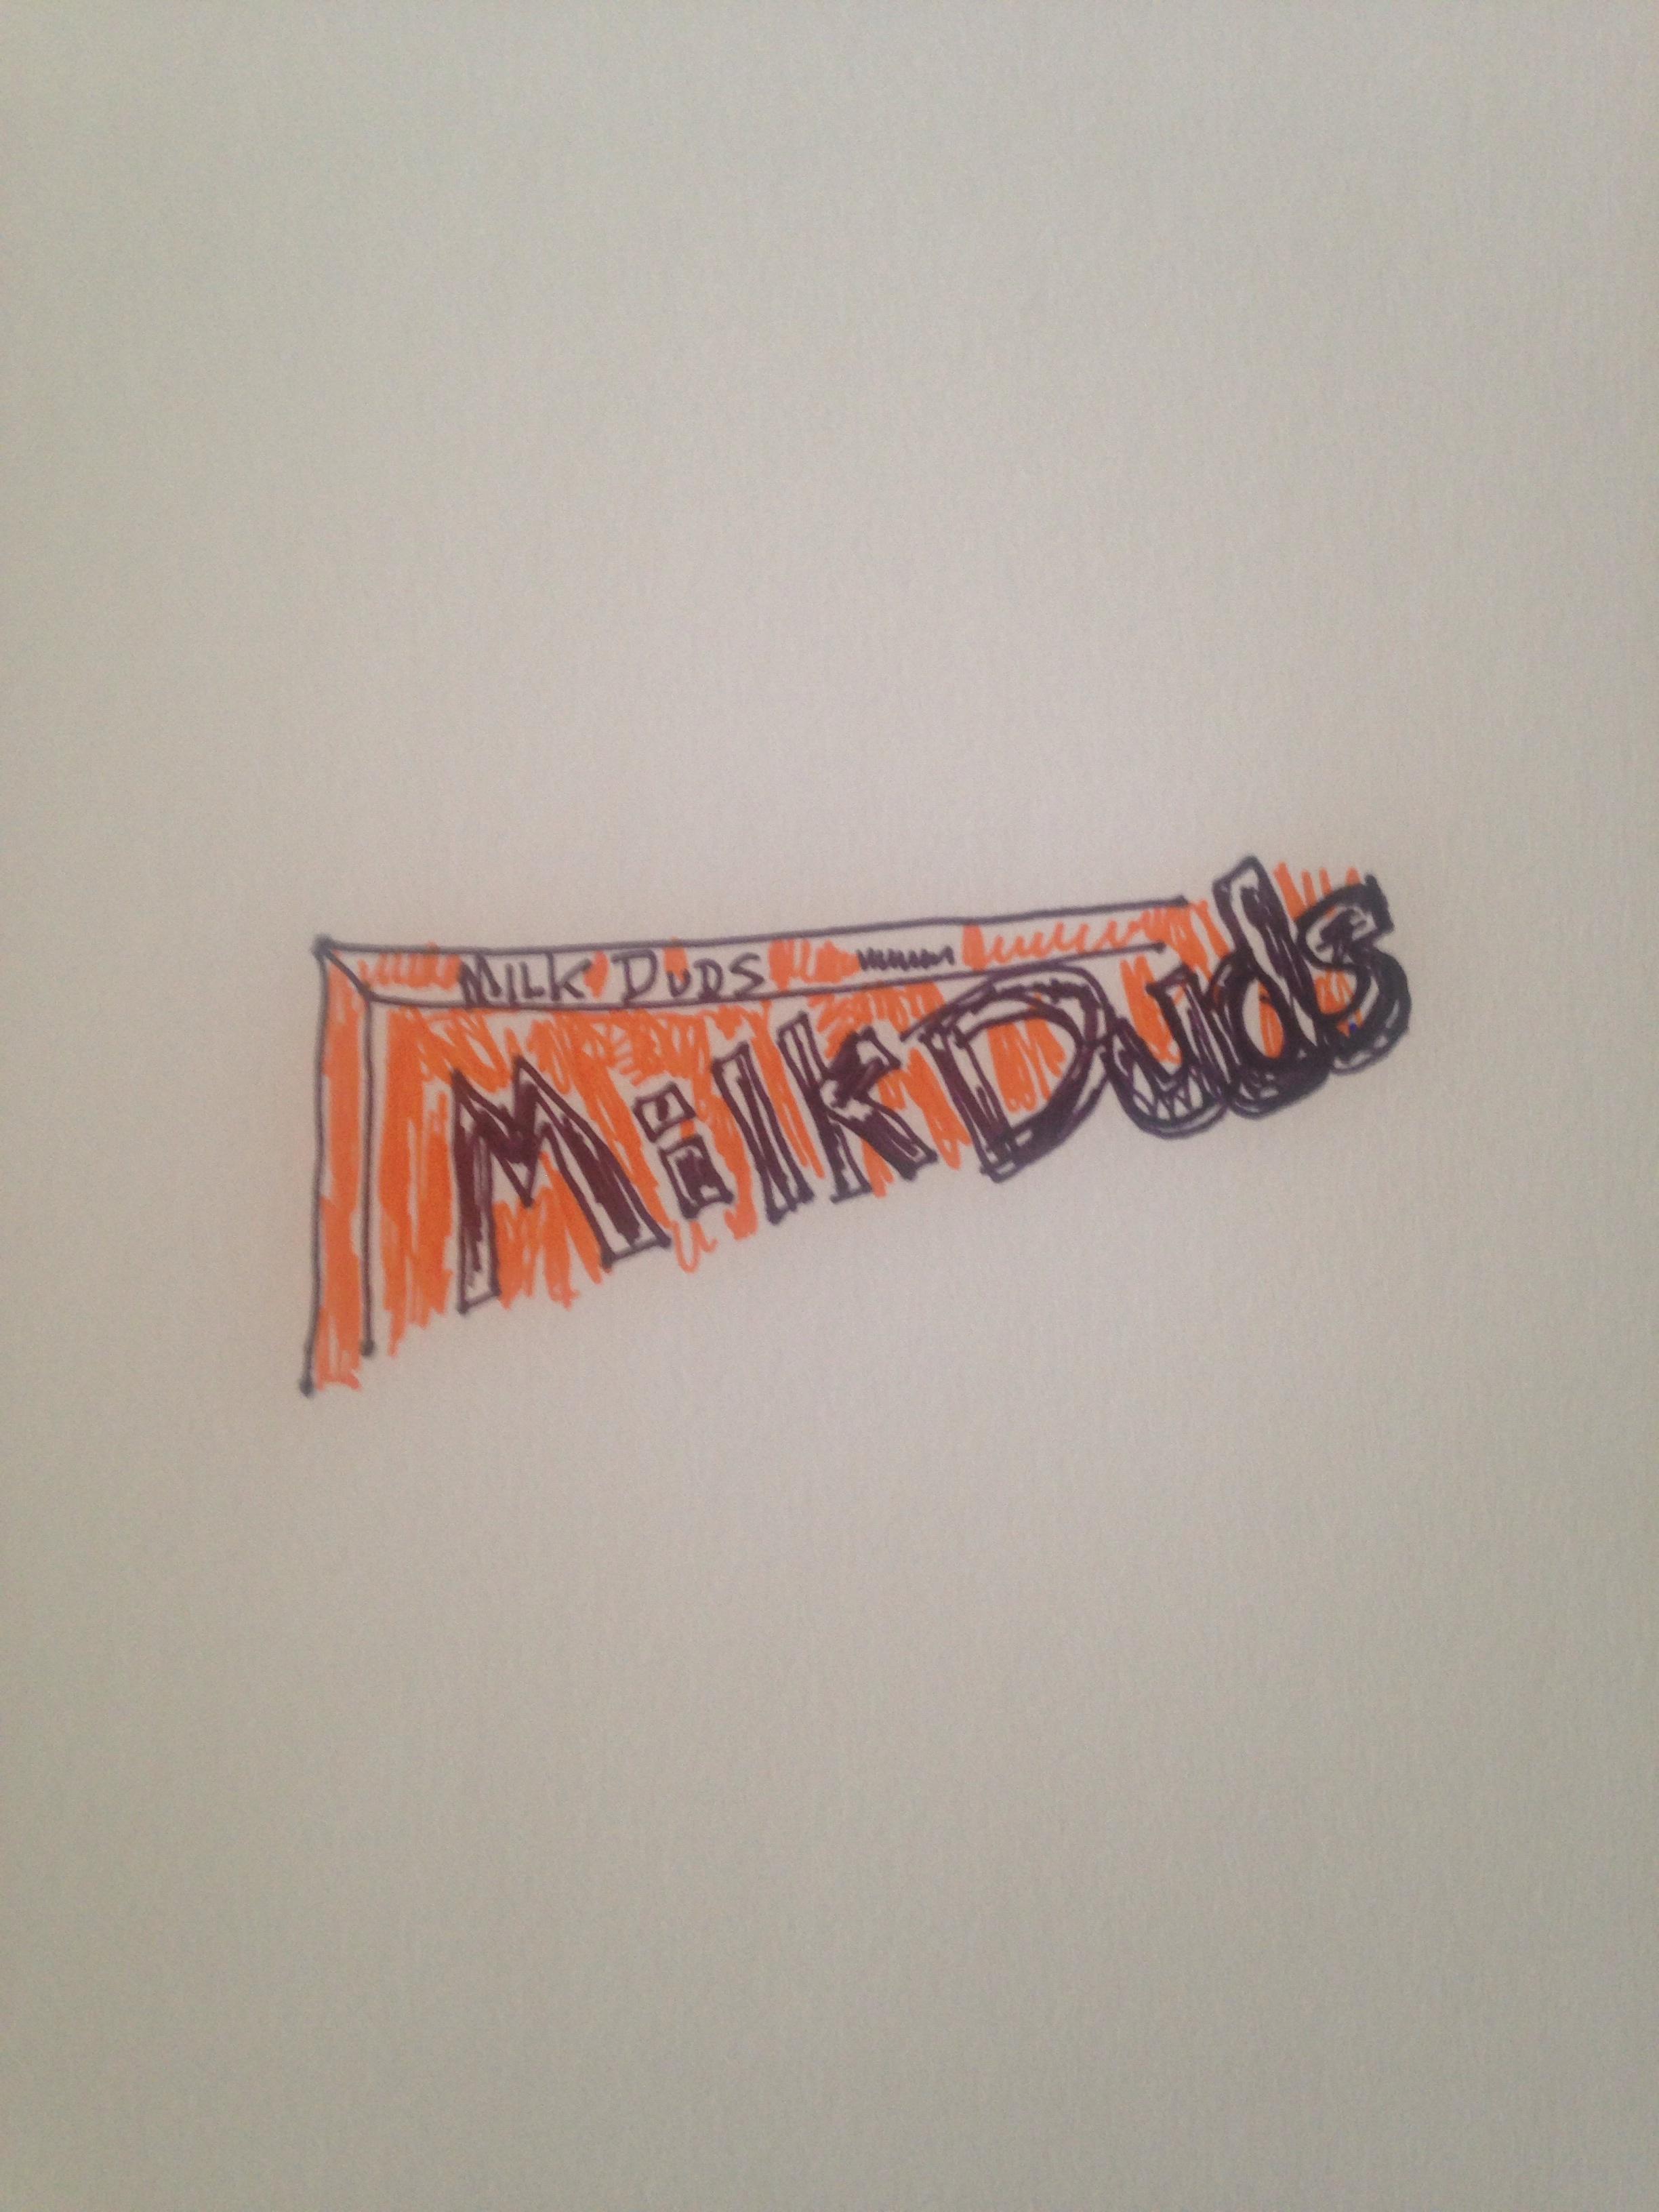 Milk Duds, 5 oz. box, artist rendering, December 22, 2016.